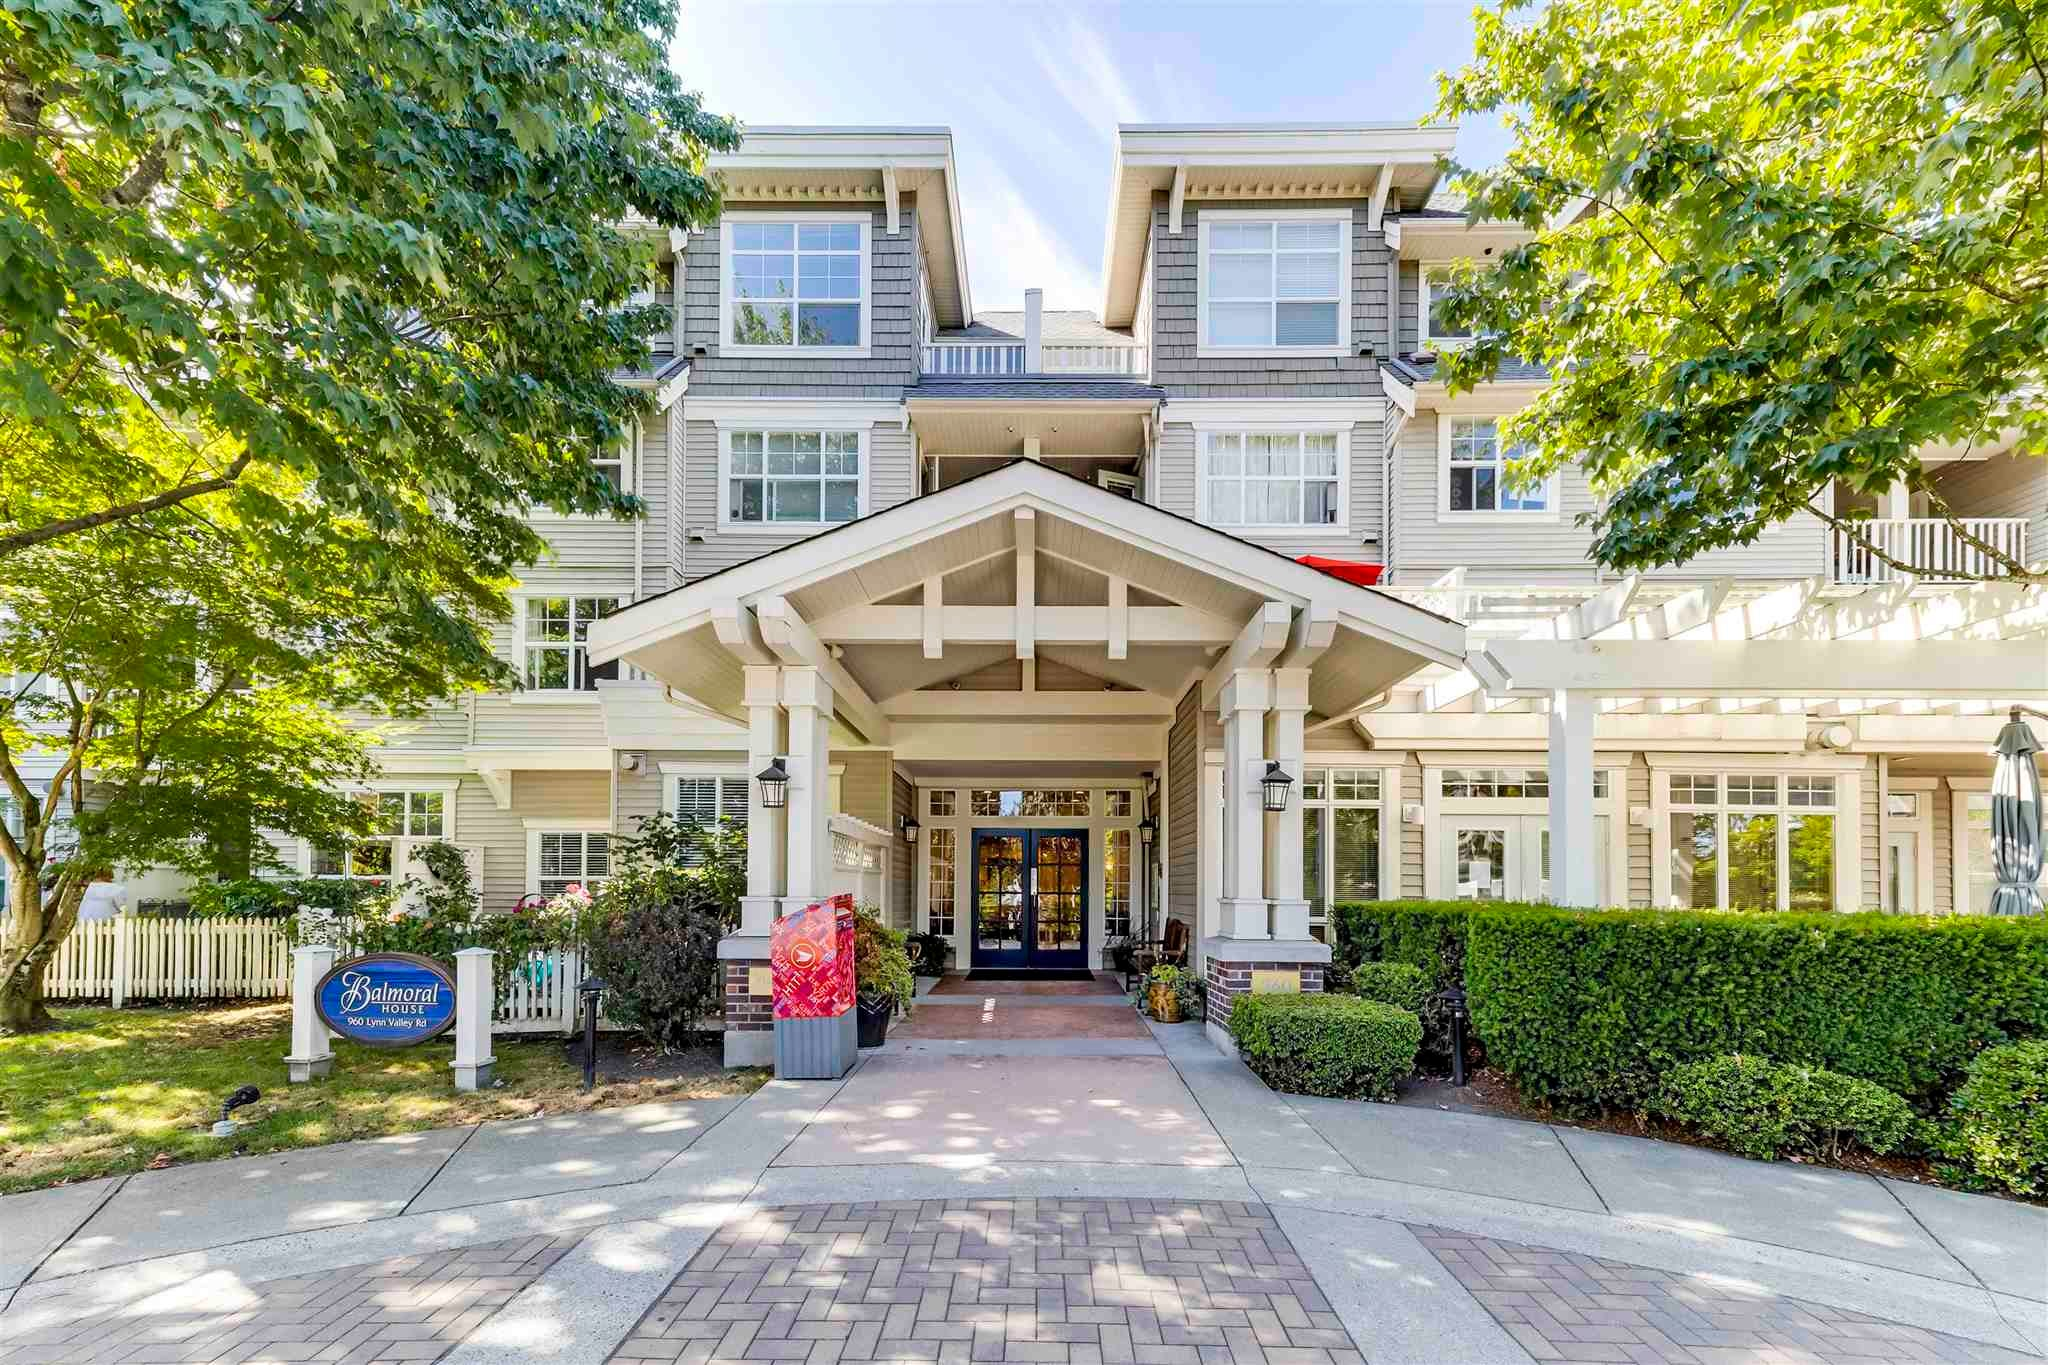 417 960 LYNN VALLEY ROAD - Lynn Valley Apartment/Condo for sale, 1 Bedroom (R2605110) - #1